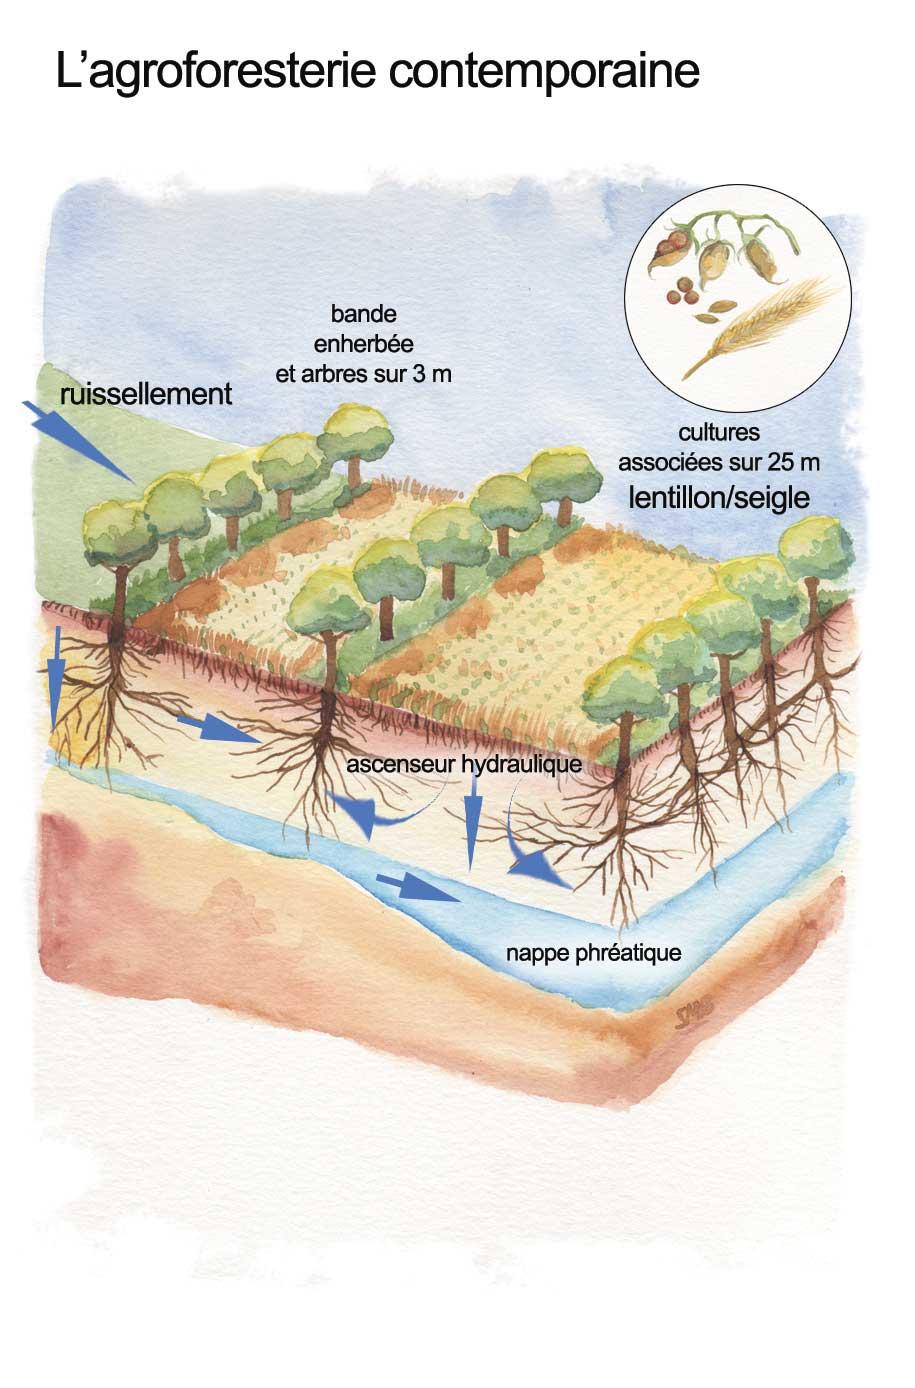 Annexe-4---agroforesterie-contemporaine.jpg